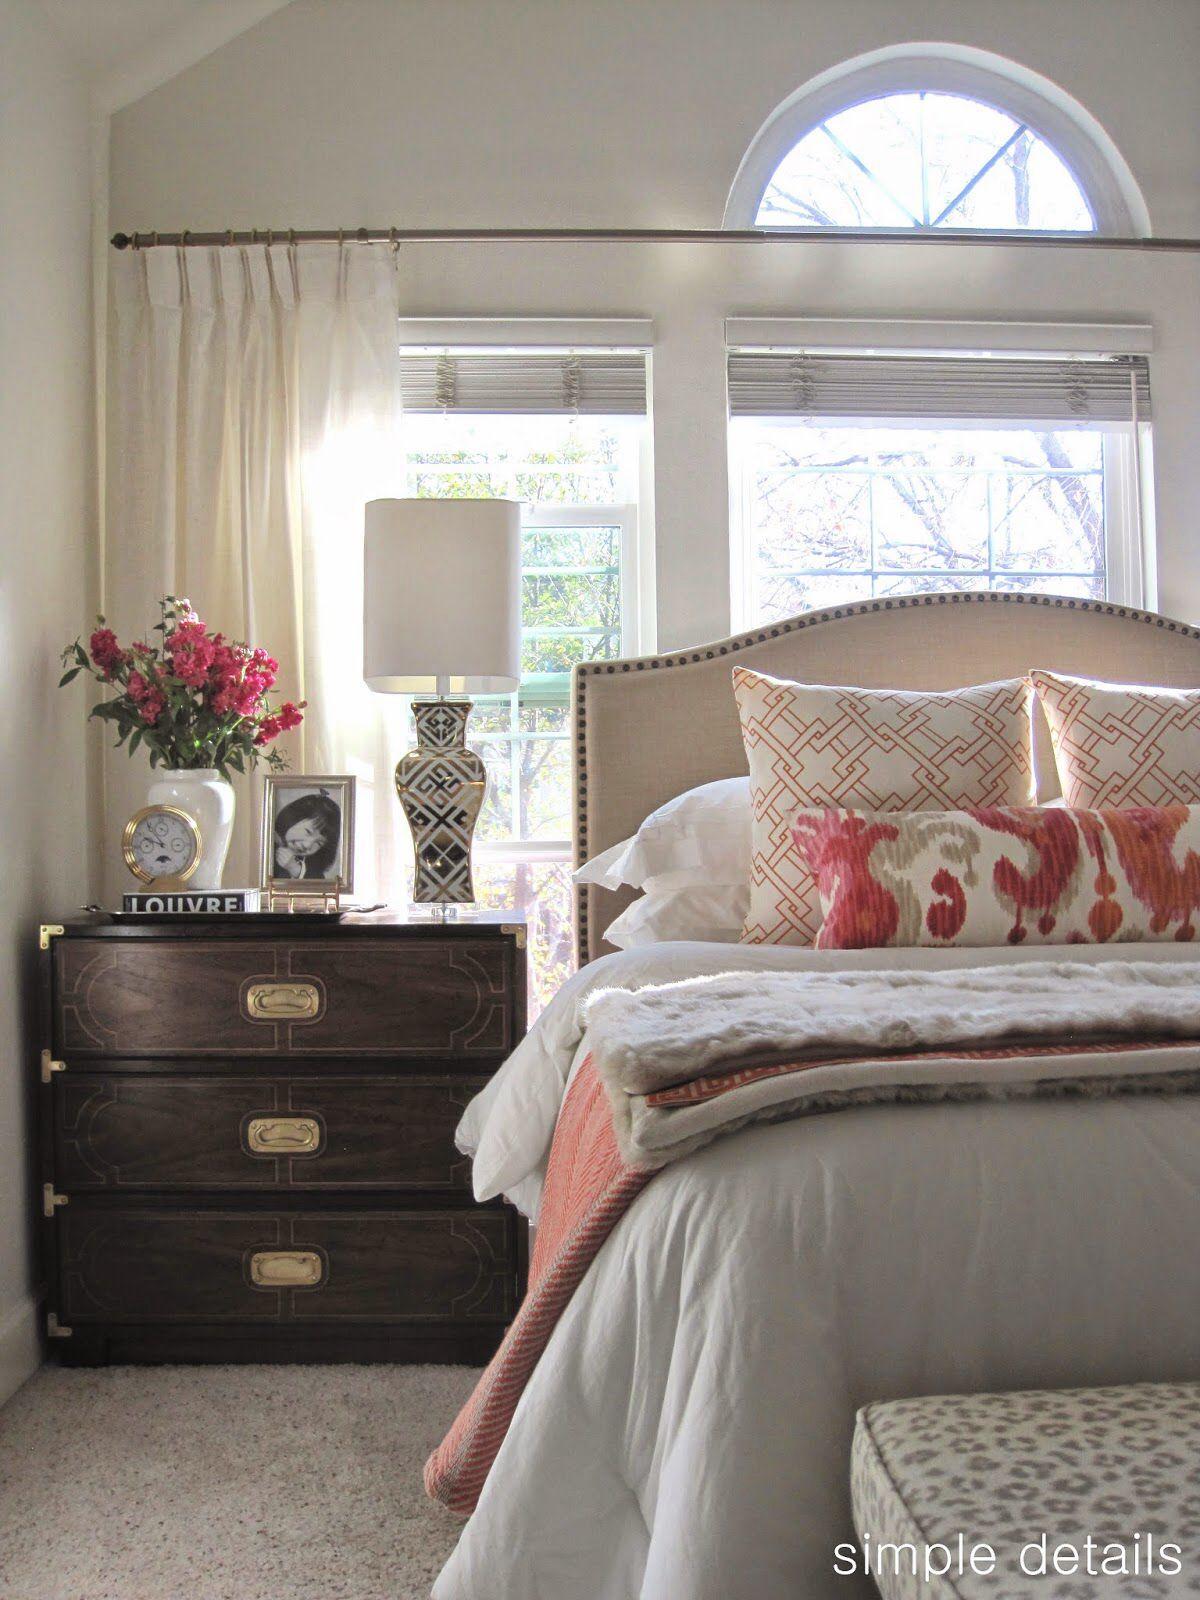 curtains!!! | bedrooms | Pinterest | Bedrooms, Master ... on Master Bedroom Curtain Ideas  id=49788